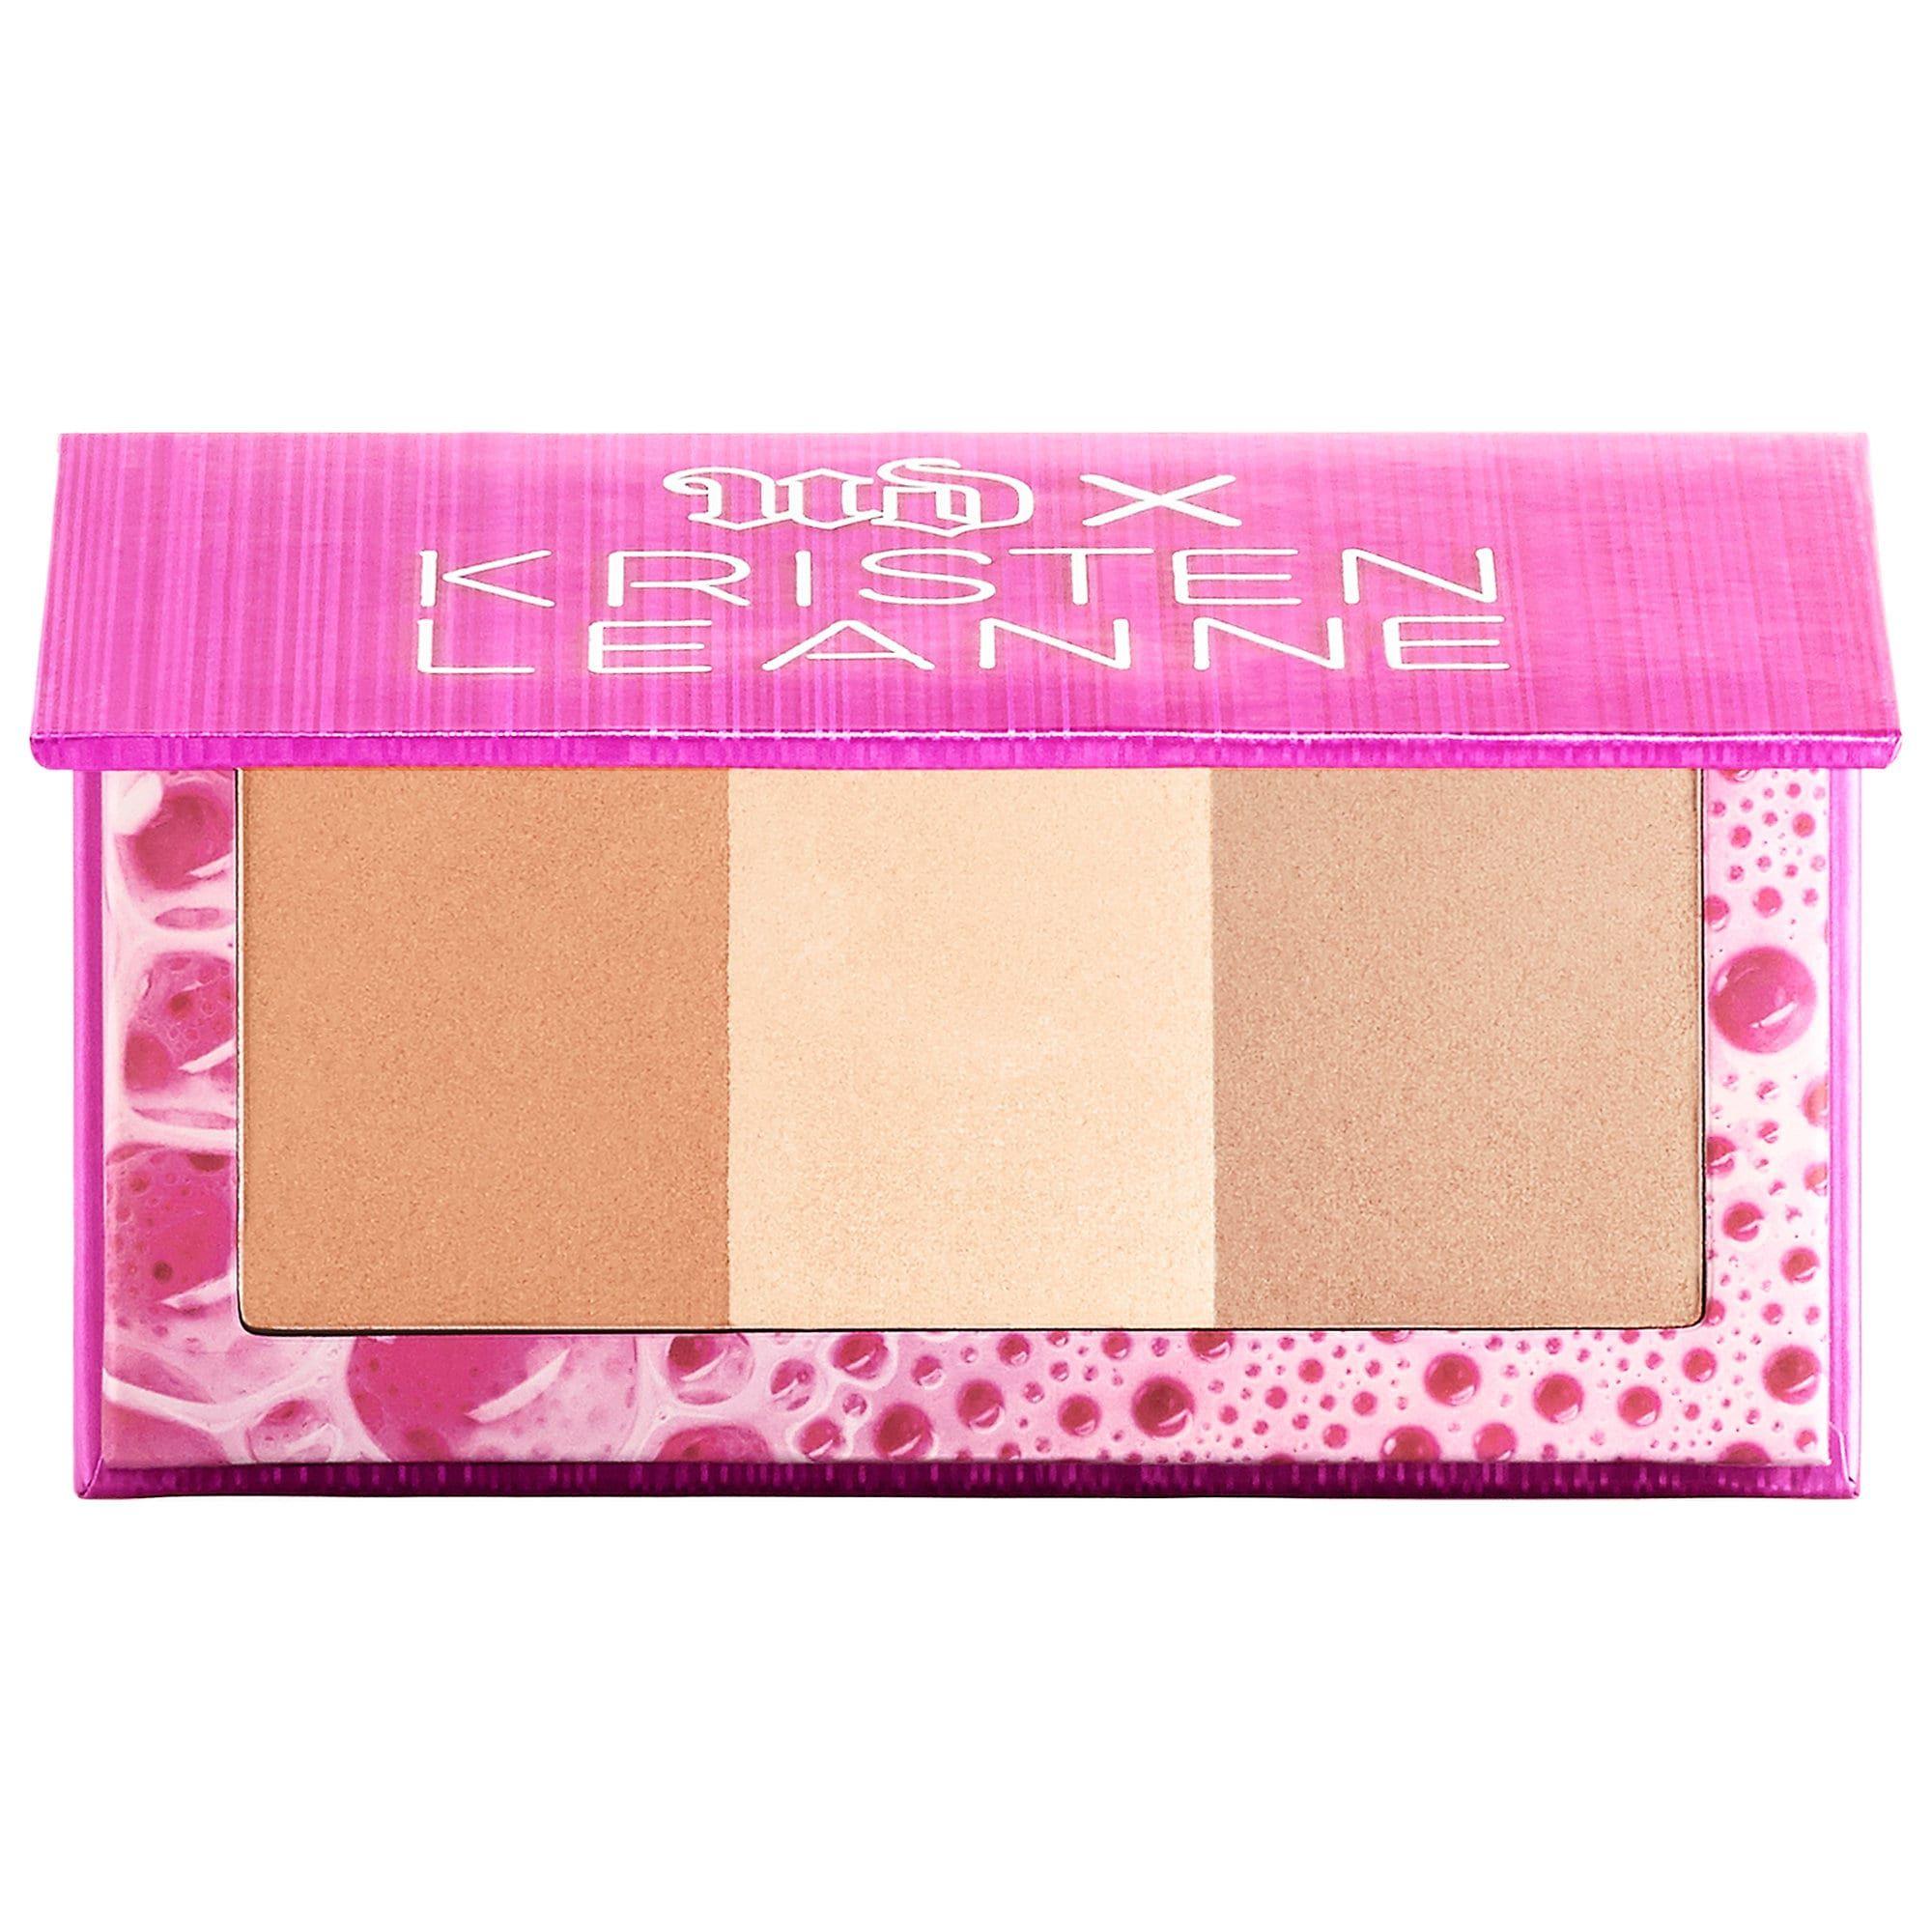 UD x Kristen Leanne Beauty Beam Highlighter Palette